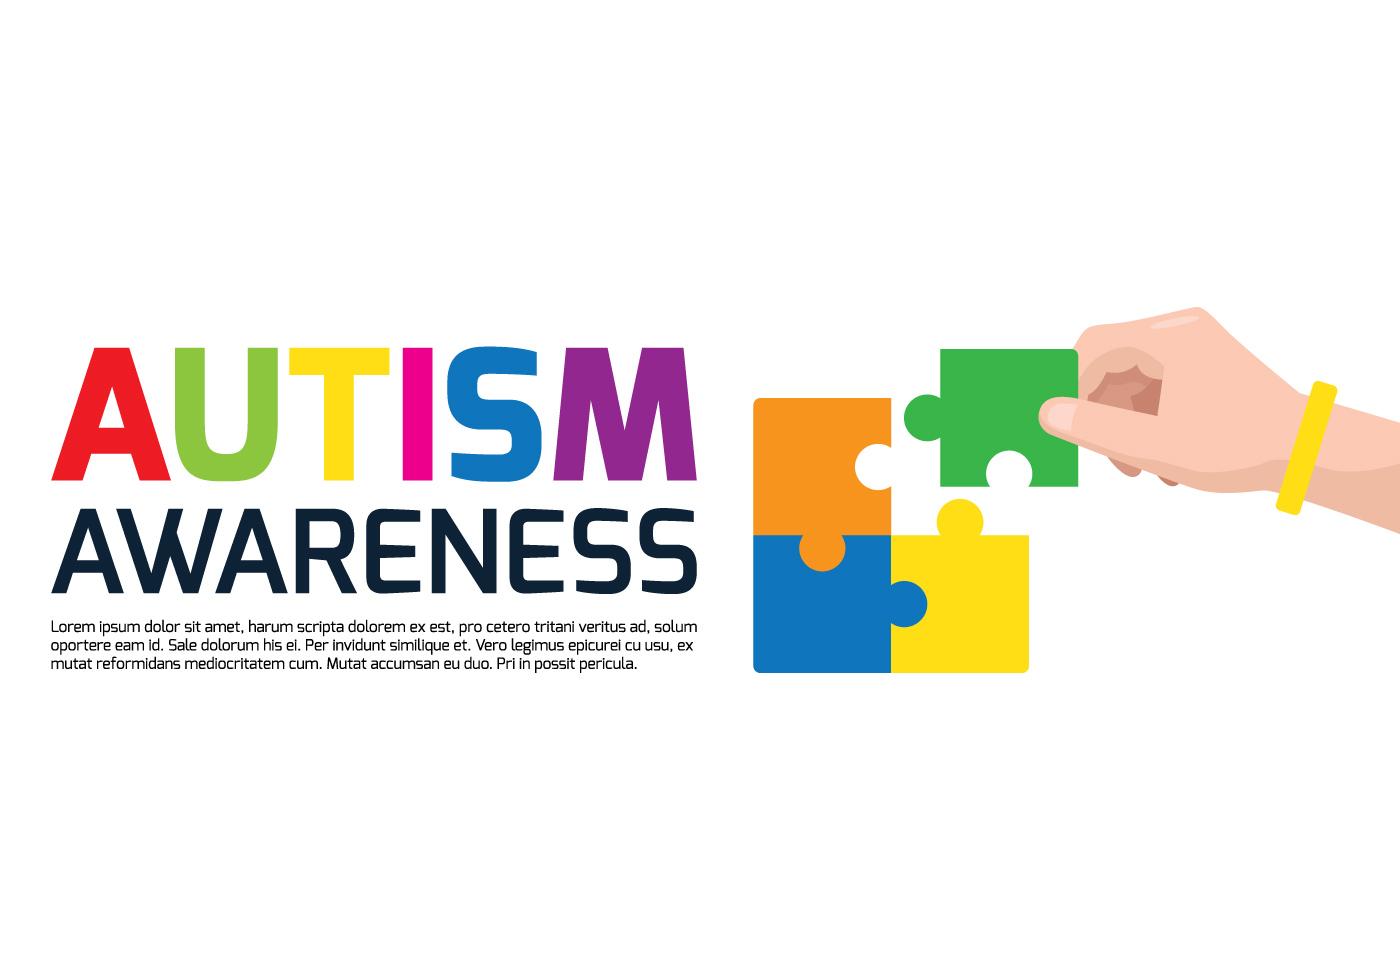 Autism Awareness Poster - Download Free Vectors, Clipart ...